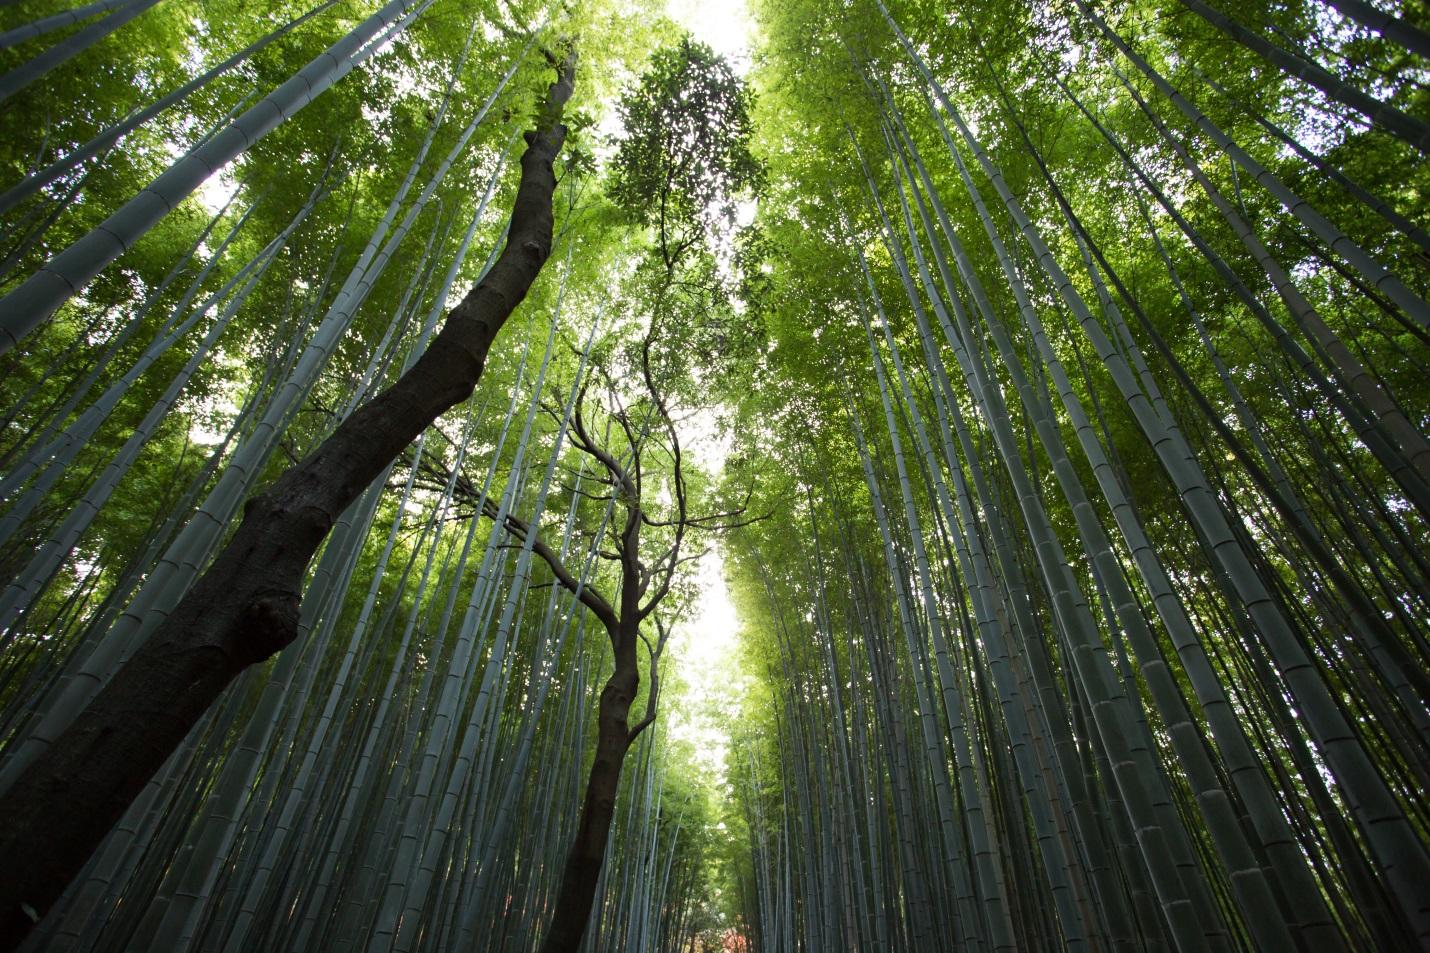 Tree, Public Relations, Marketing, Branding, Garden Media Group, Earth Day, Green Living